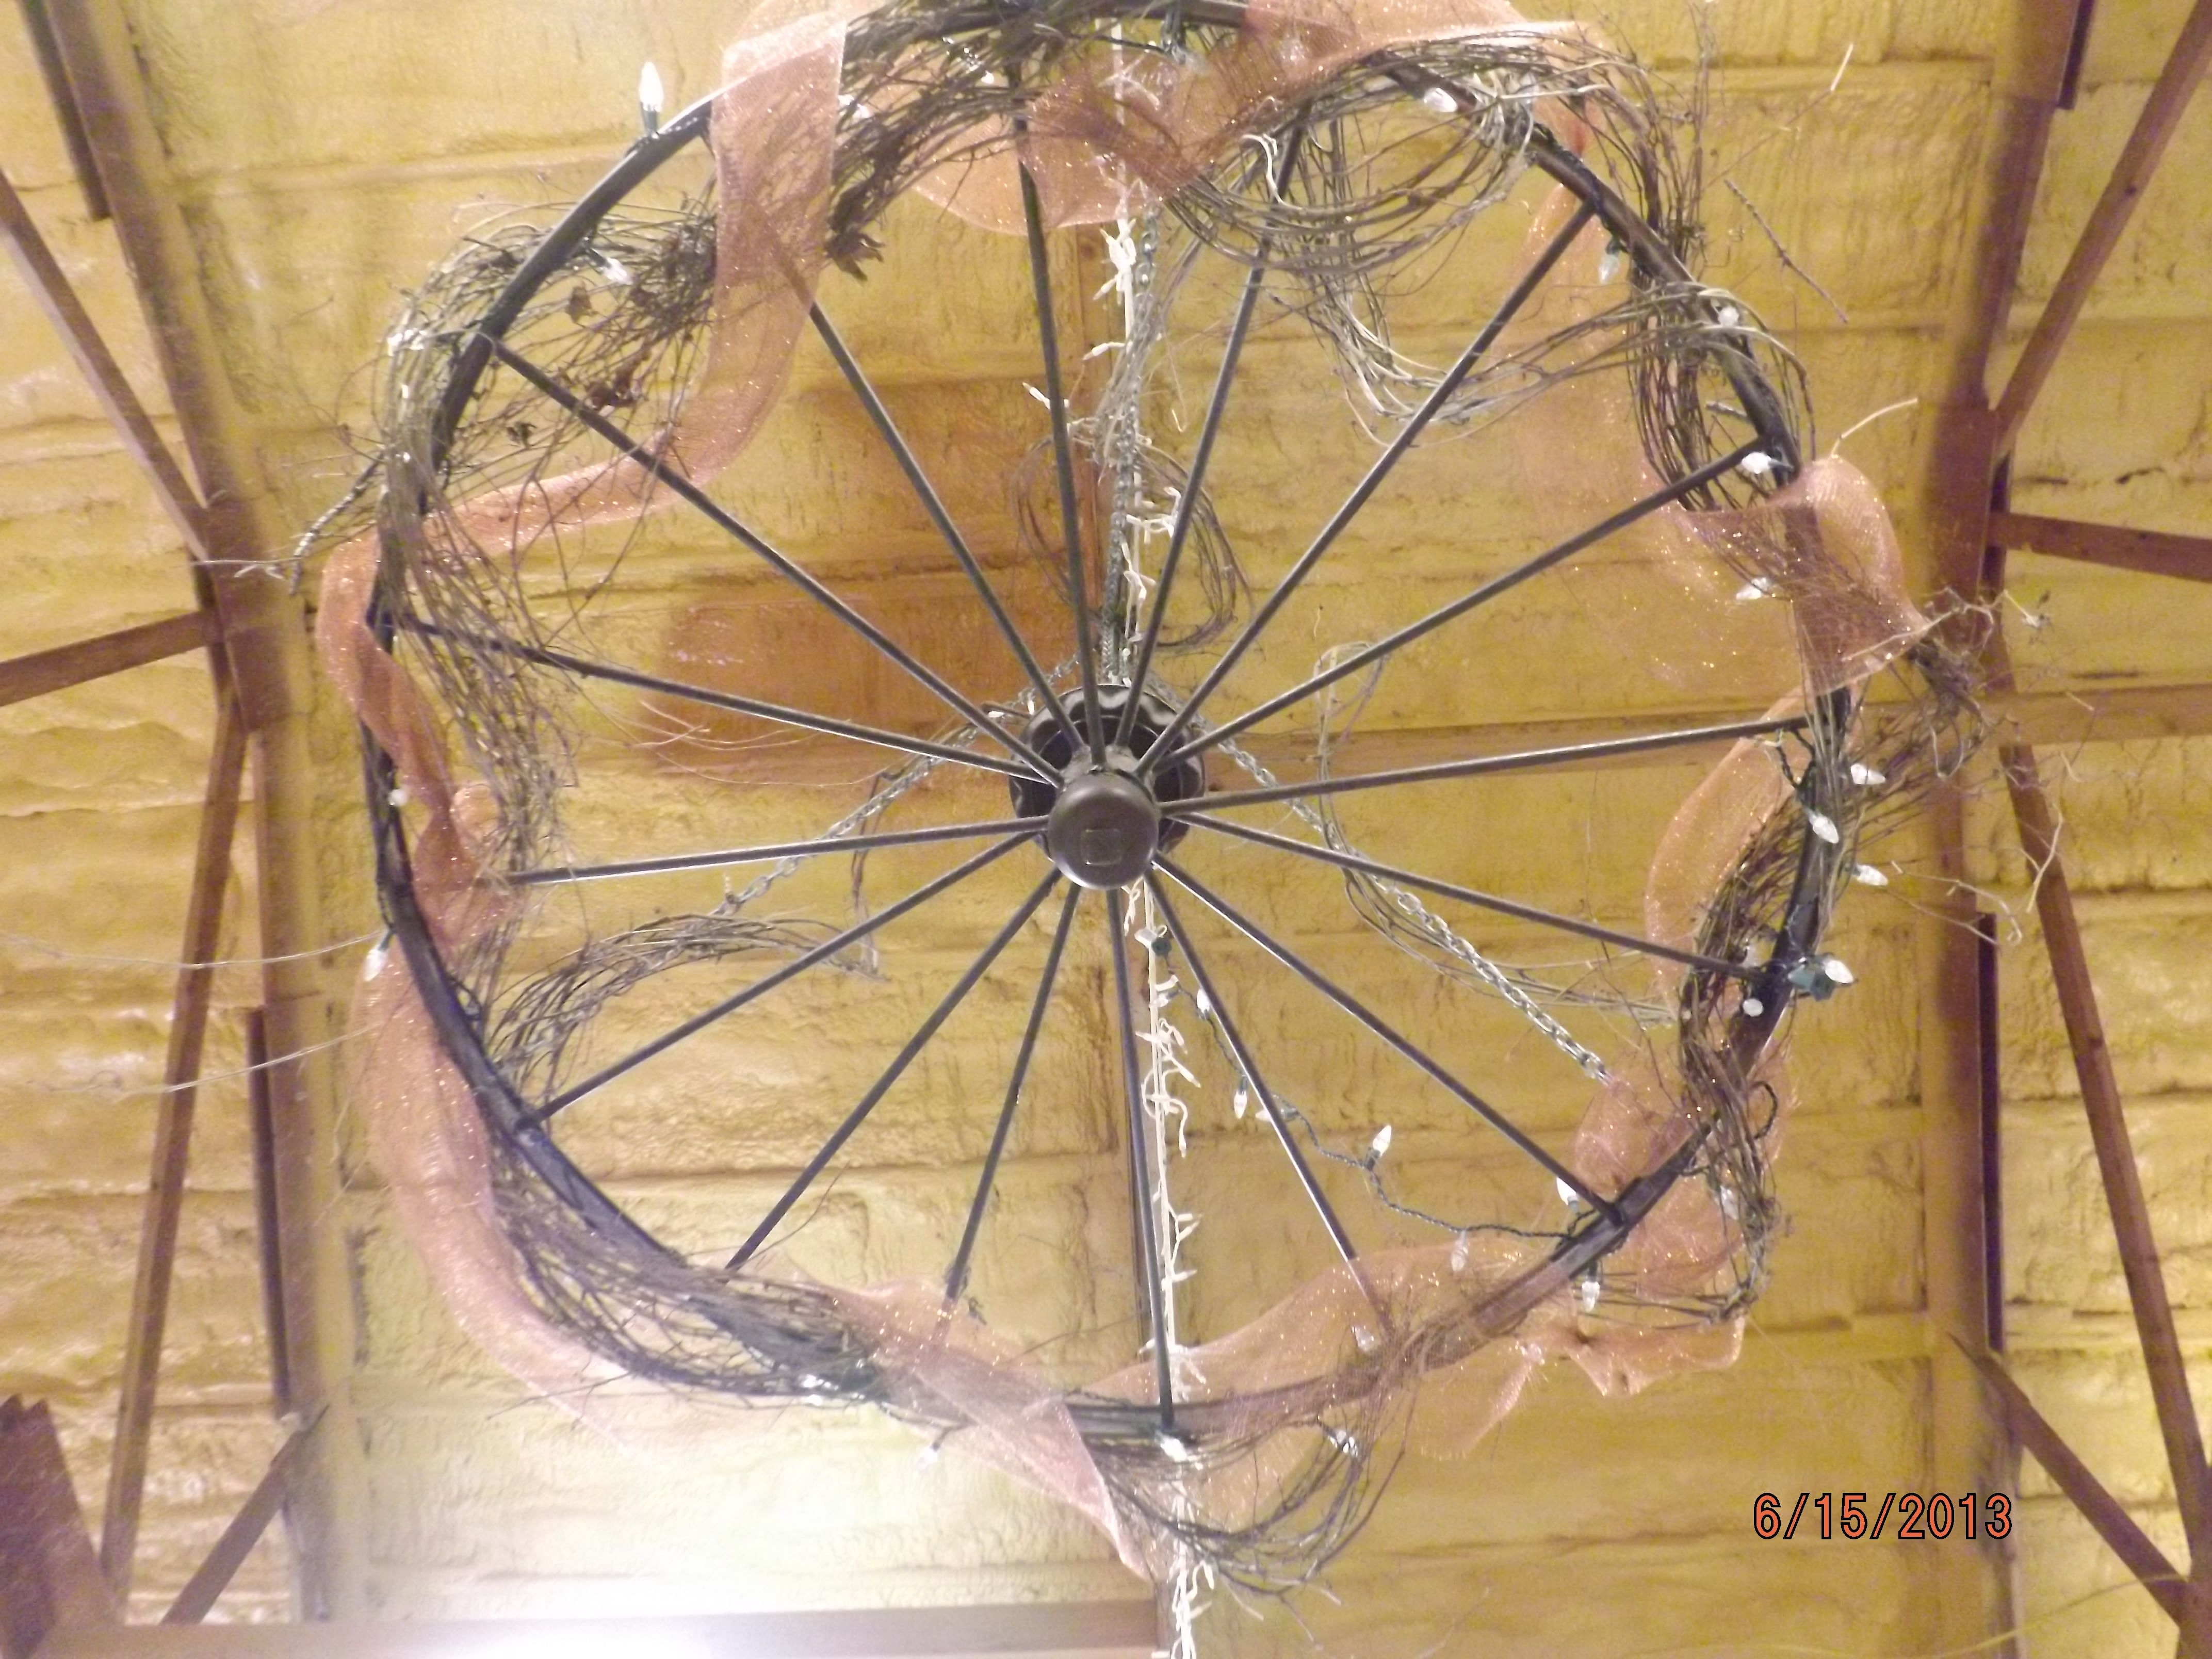 Wagon wheel decked out for wedding reception chandelier diy